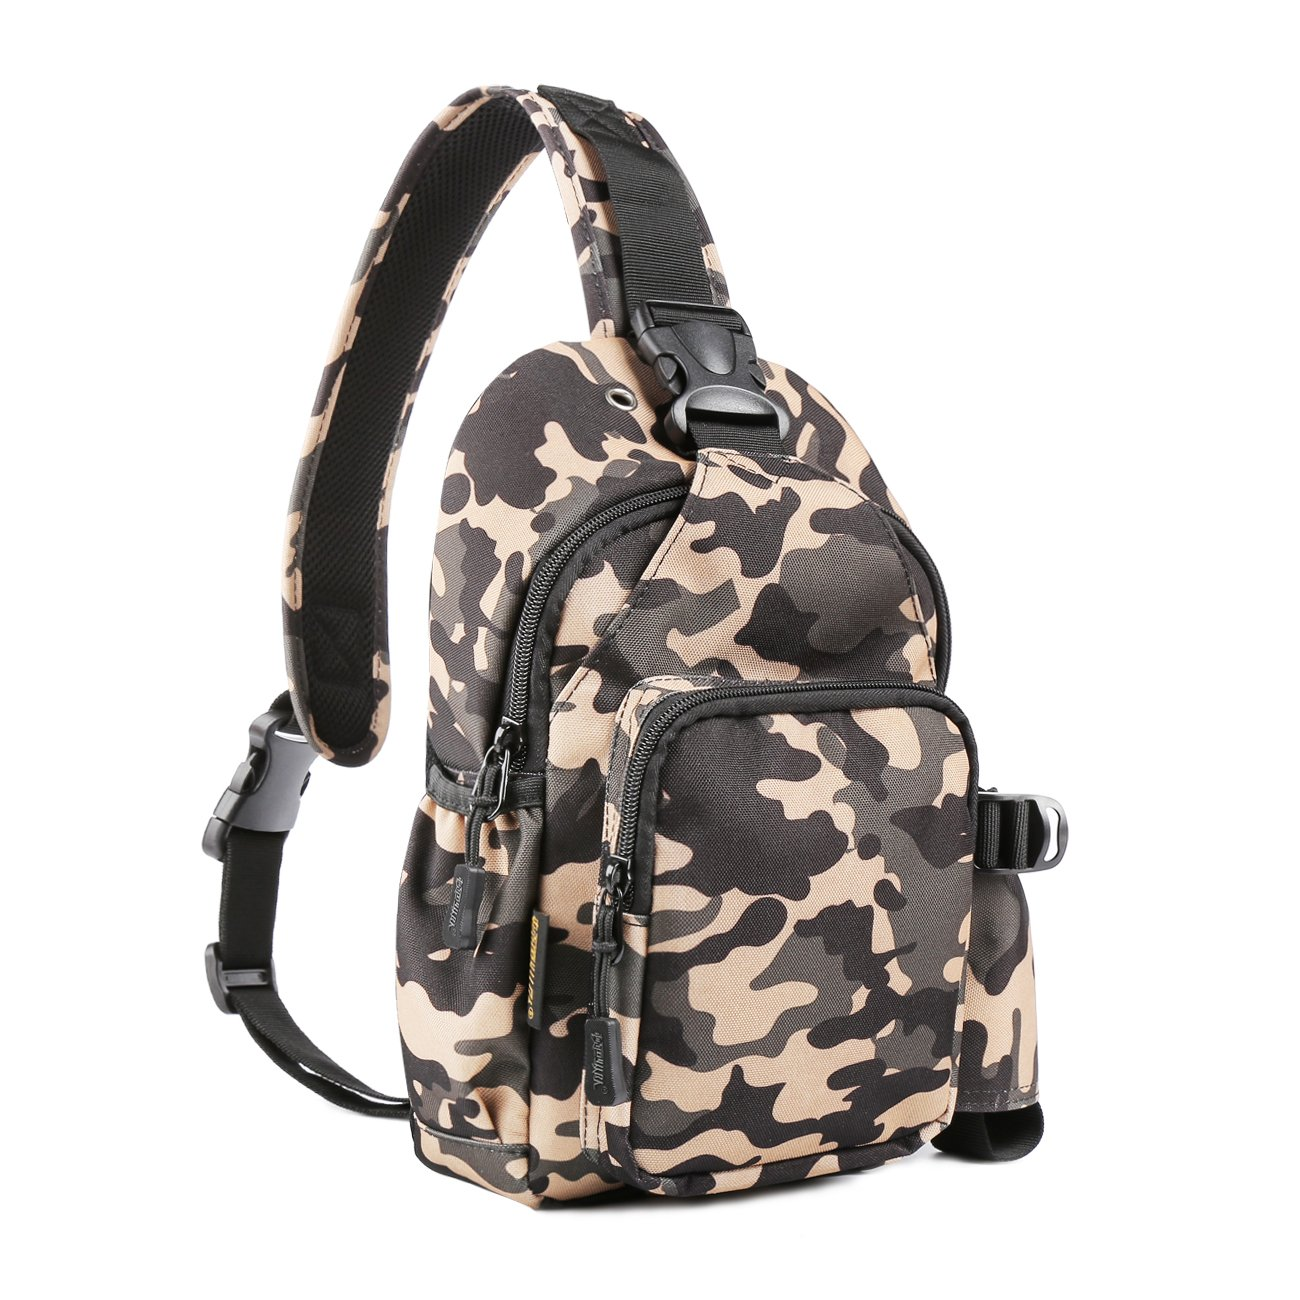 myoldsx Sling Bag Pack, impermeable pecho hombro Crossbody Mochila de senderismo, escuela bolsas Camping gimnasio ciclismo bicicleta mochila bolso para ...